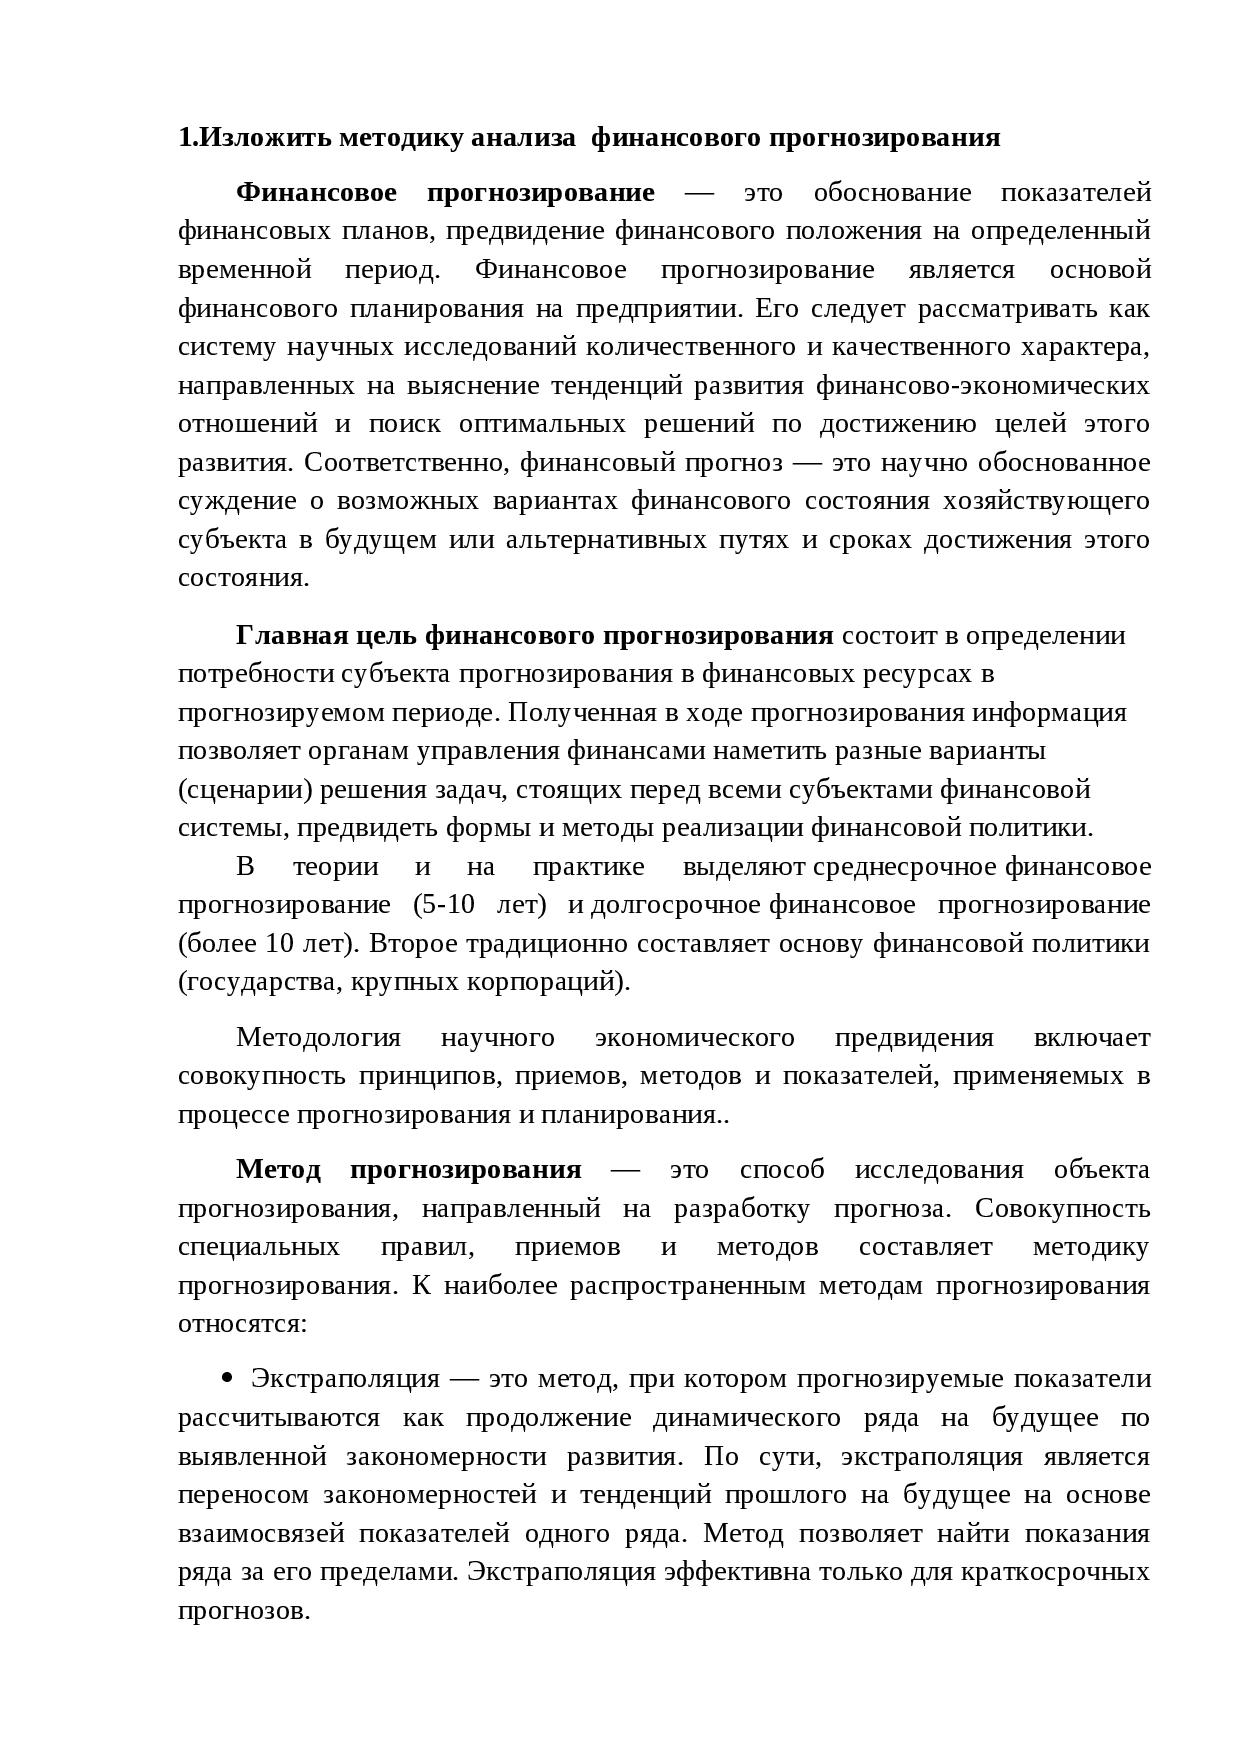 Экстраполяция - extrapolation - qwe.wiki